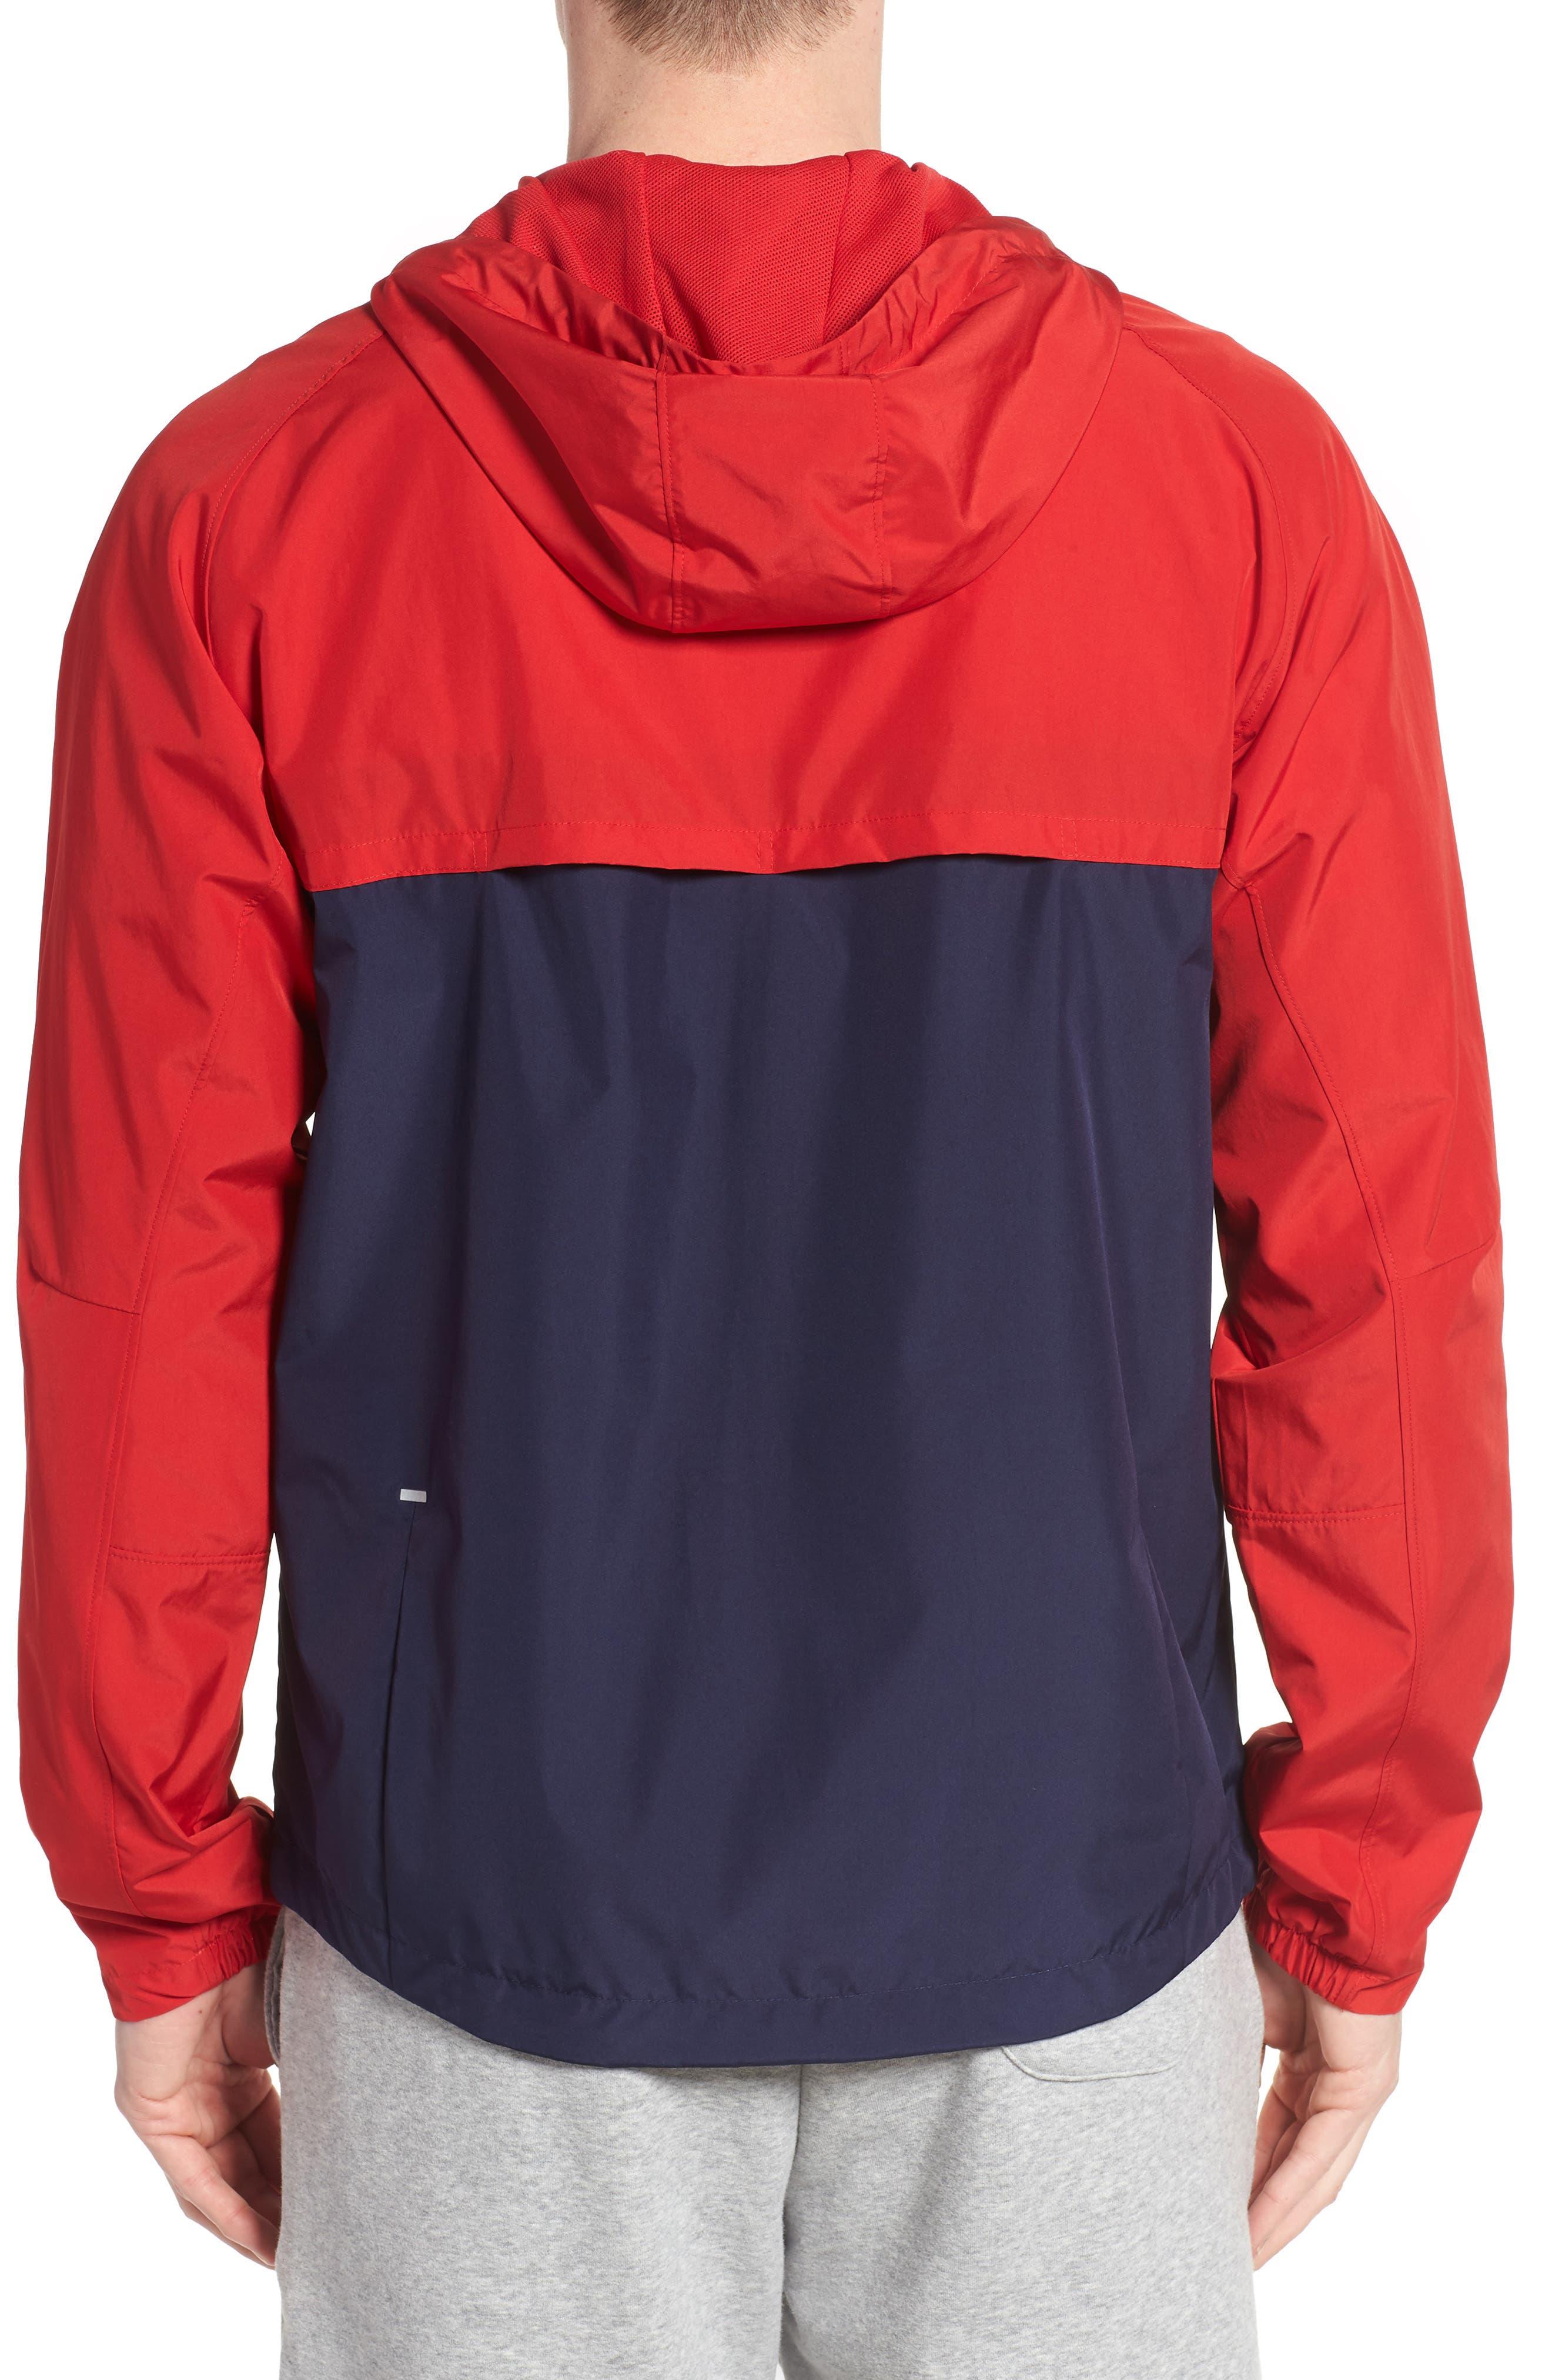 Athletics 78 Jacket,                             Alternate thumbnail 2, color,                             Team Red